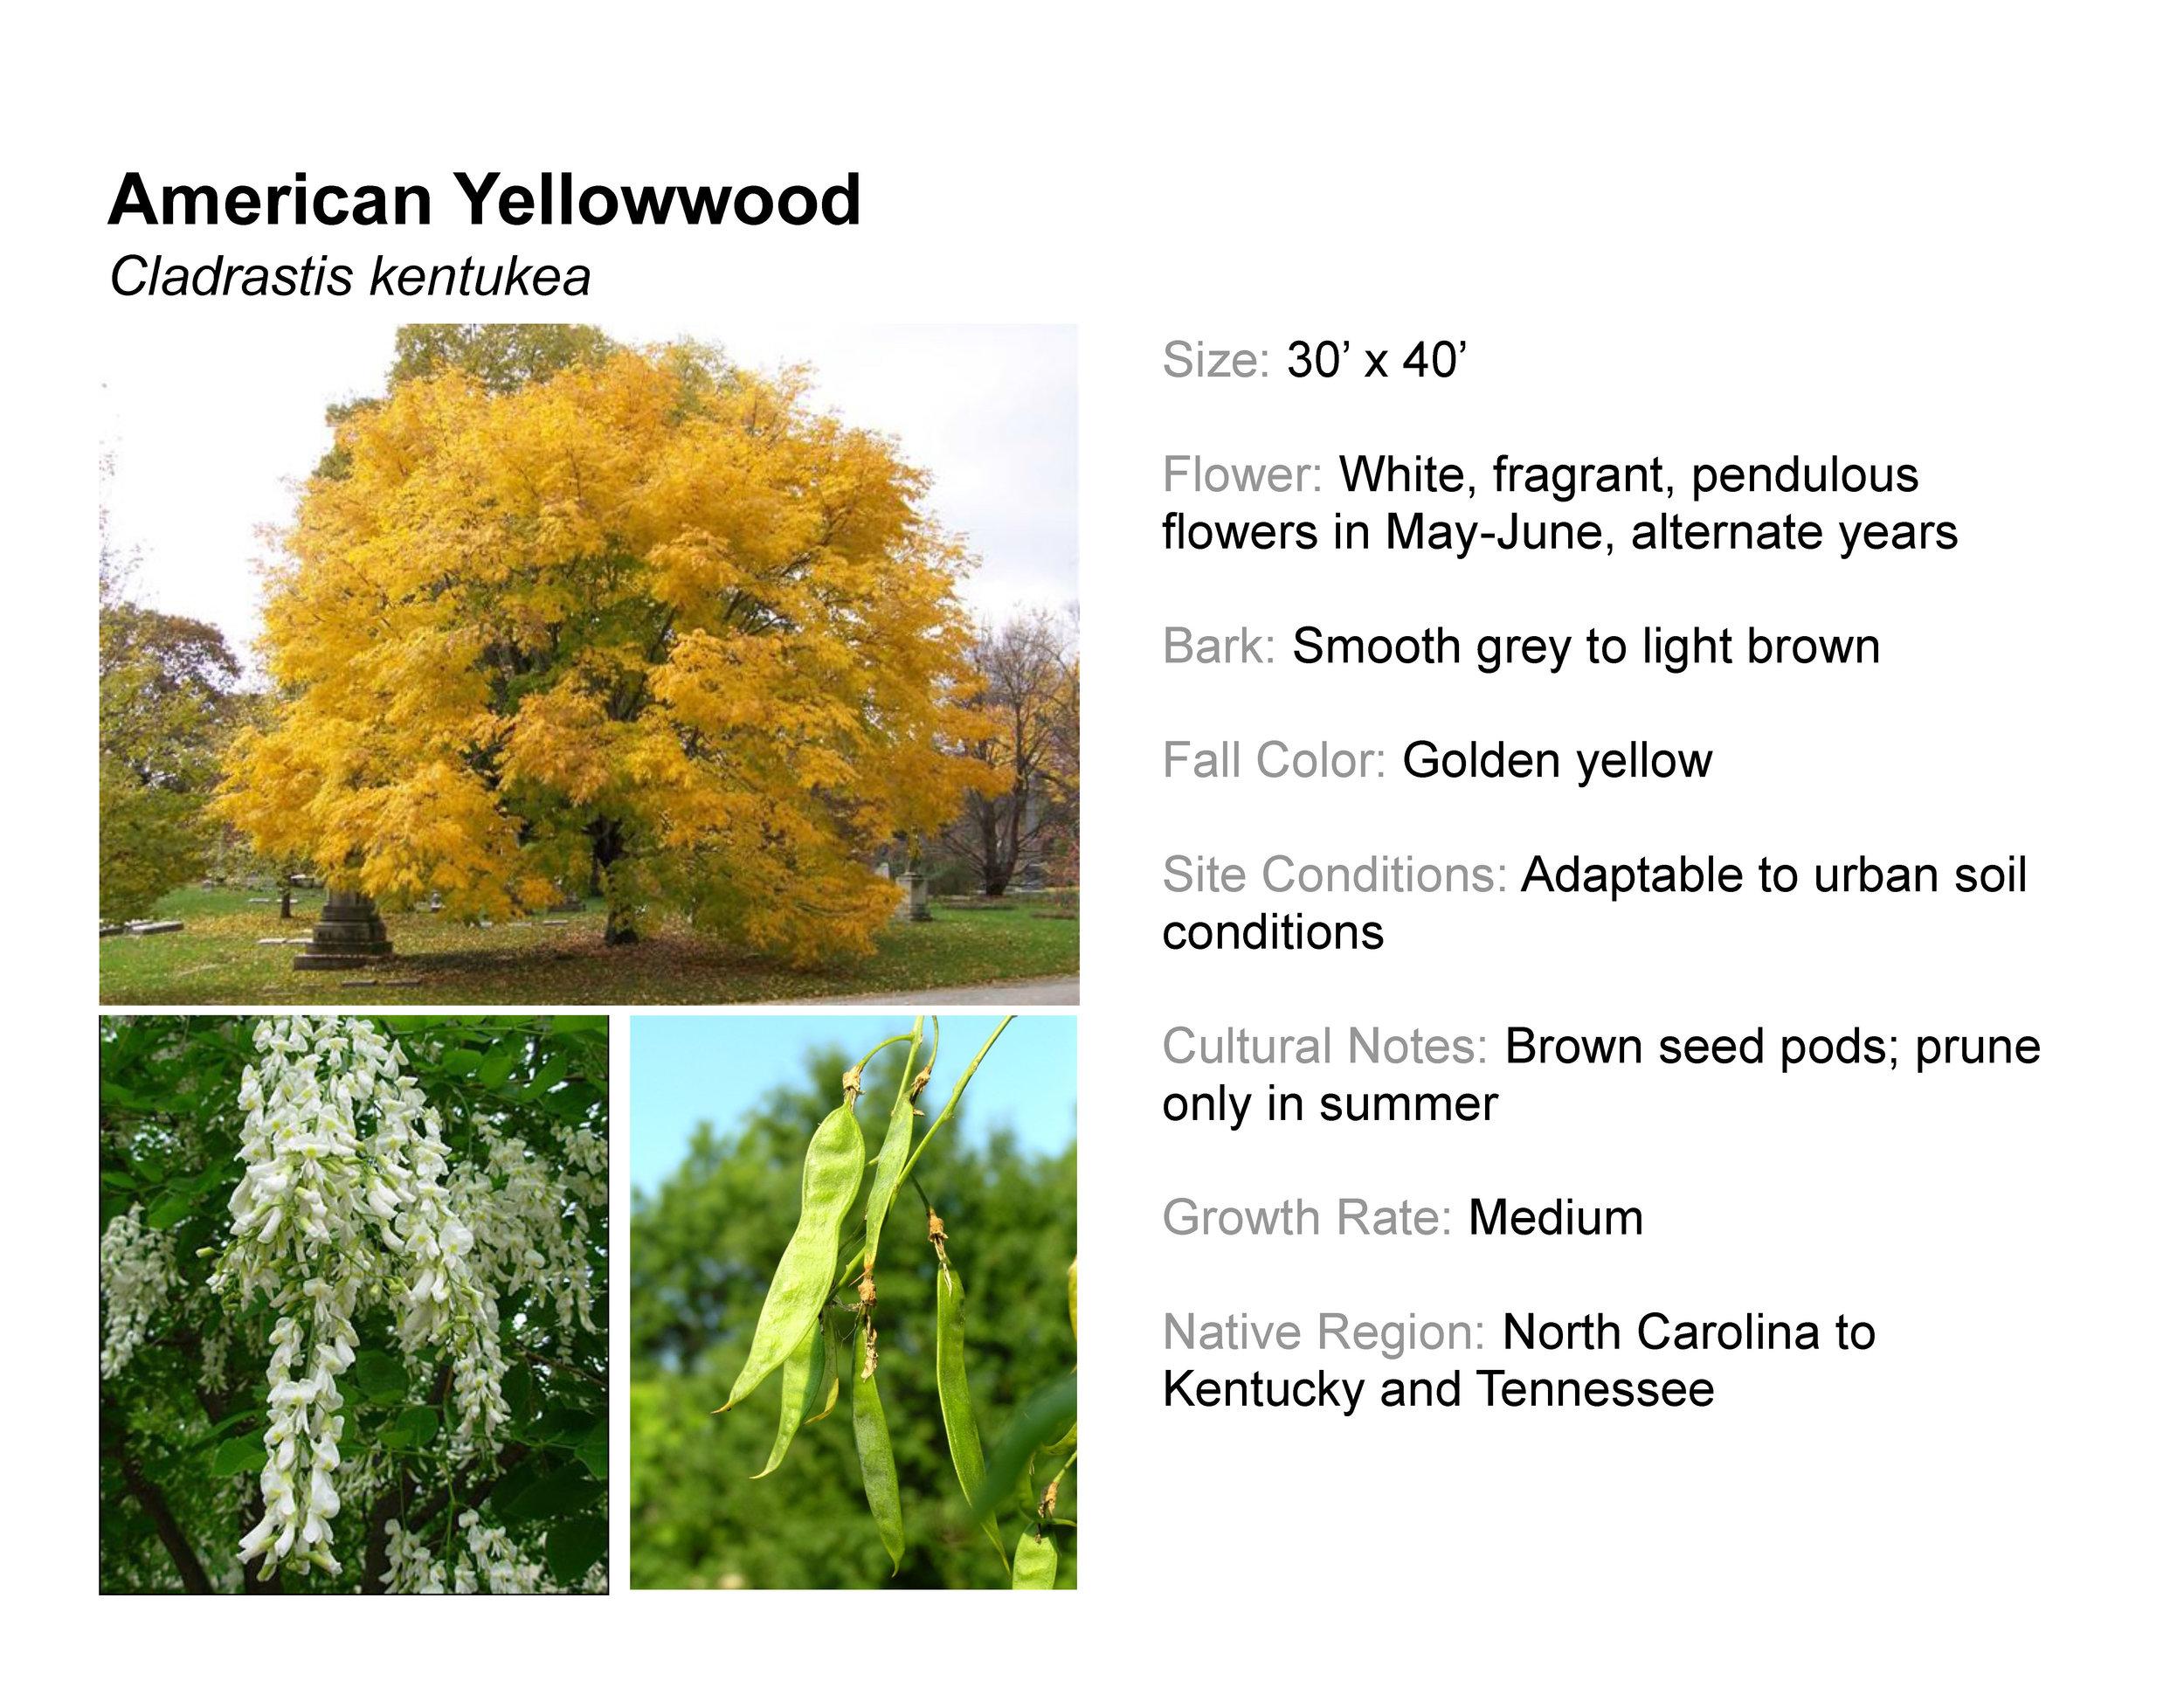 American Yellowwood